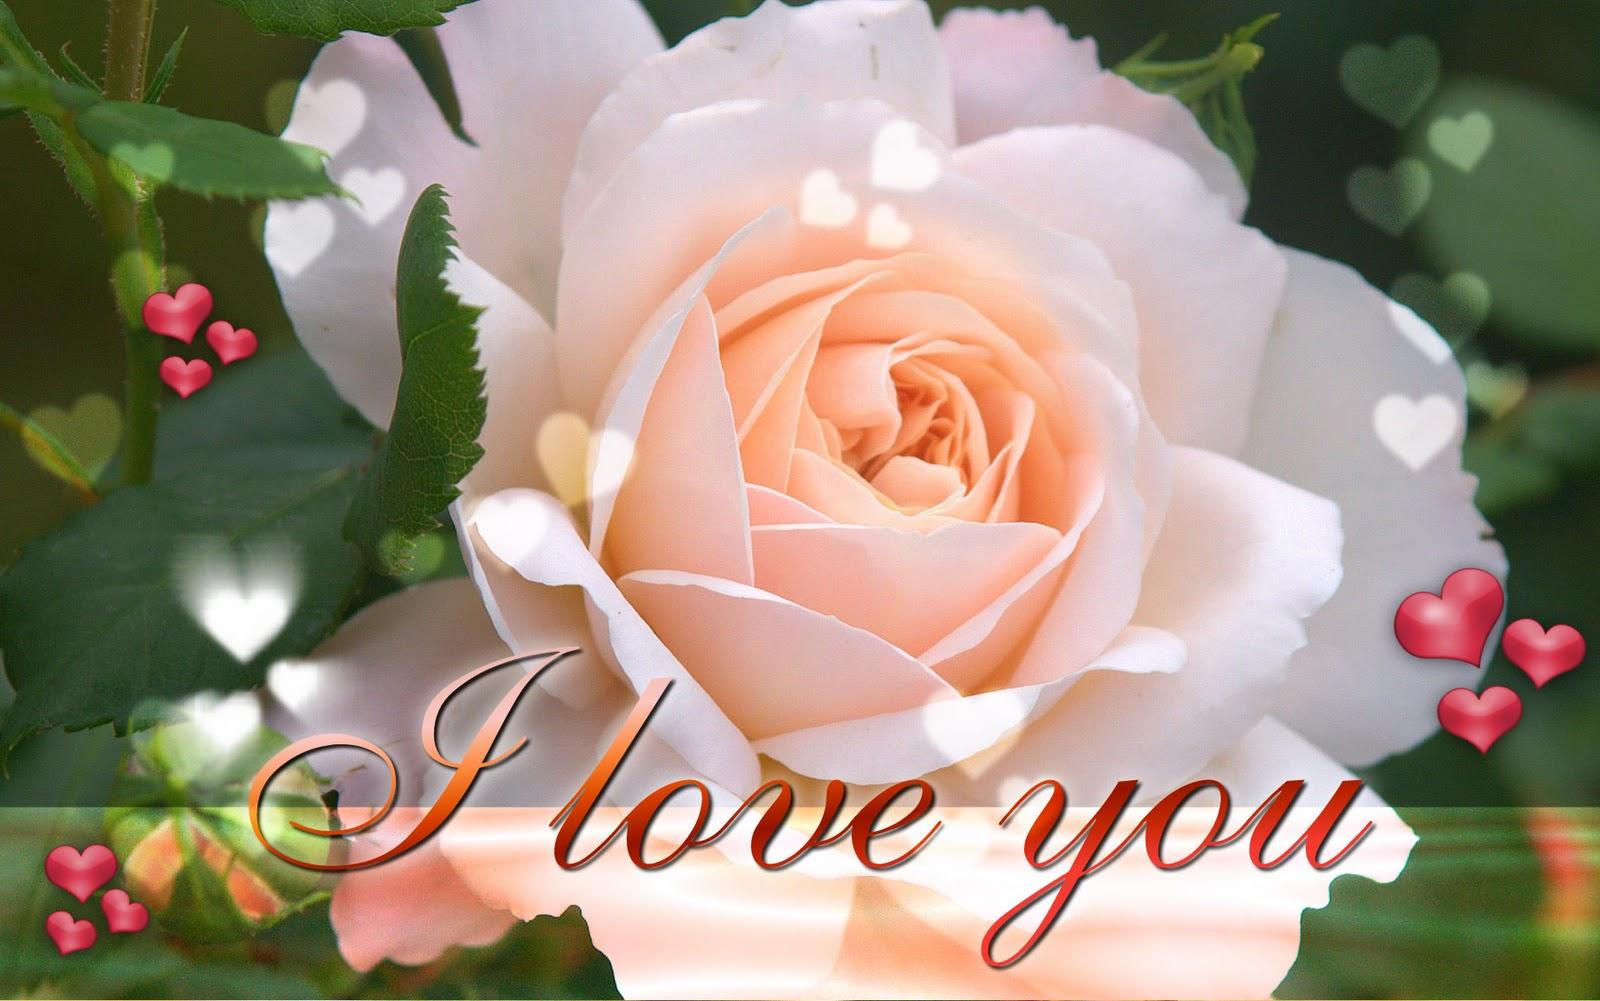 http://3.bp.blogspot.com/--CB3NrWVO9I/TttWXi6yUSI/AAAAAAAABOM/-uzUnSi0L7k/s1600/i-love-you-ecard-wallpaper.jpg